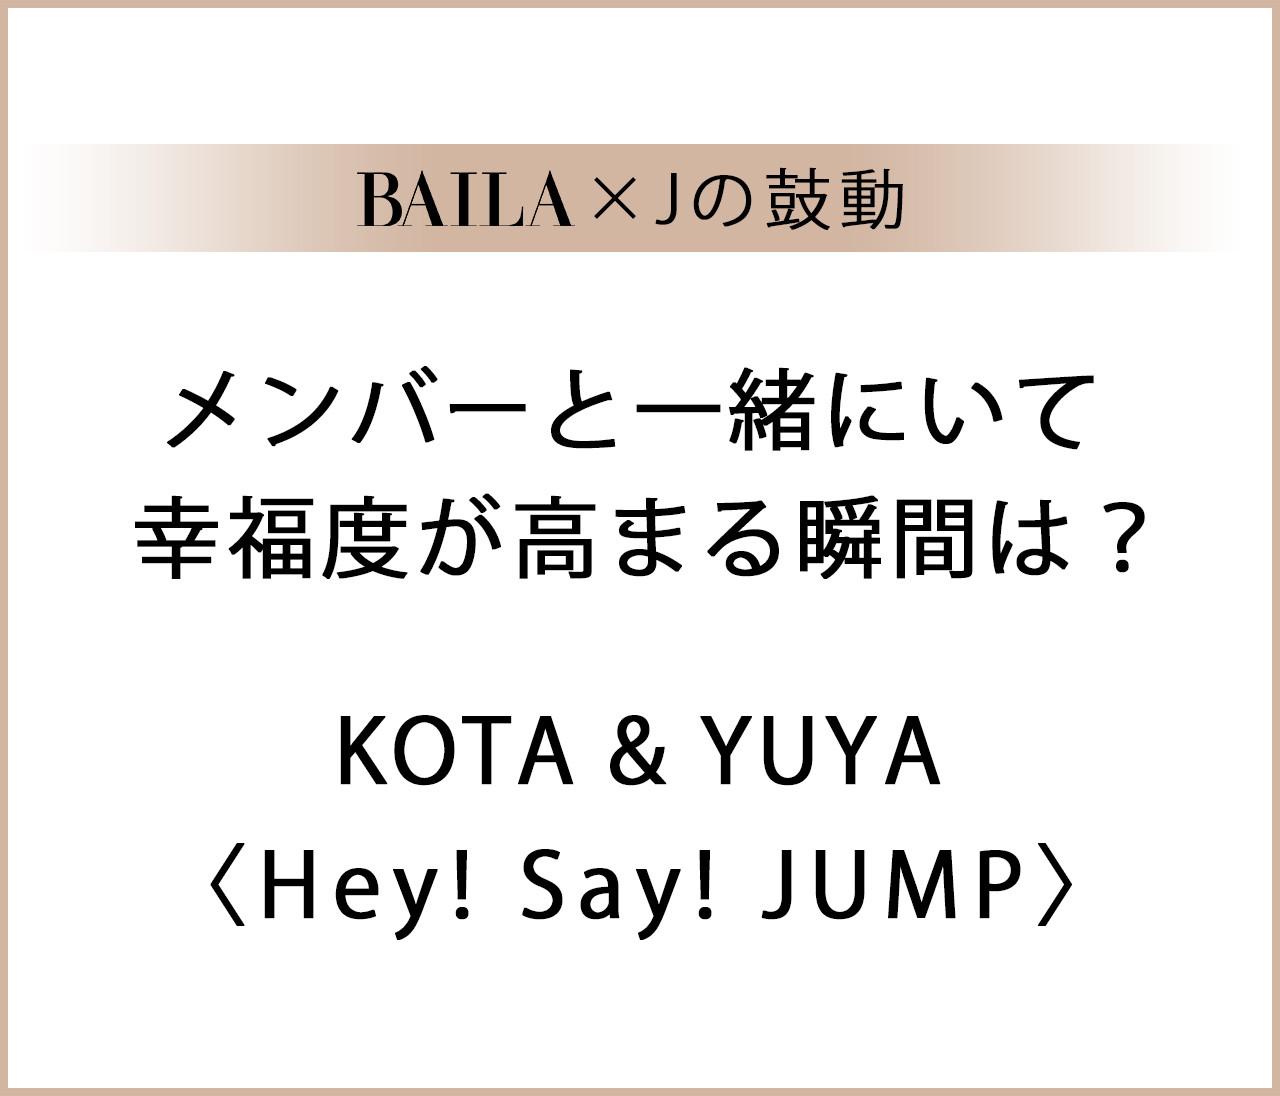 【 #HeySayJUMP #薮 宏太 #髙木雄也 】メンバーと一緒にいて幸福度が高まる瞬間は?【BAILA × Jの鼓動】